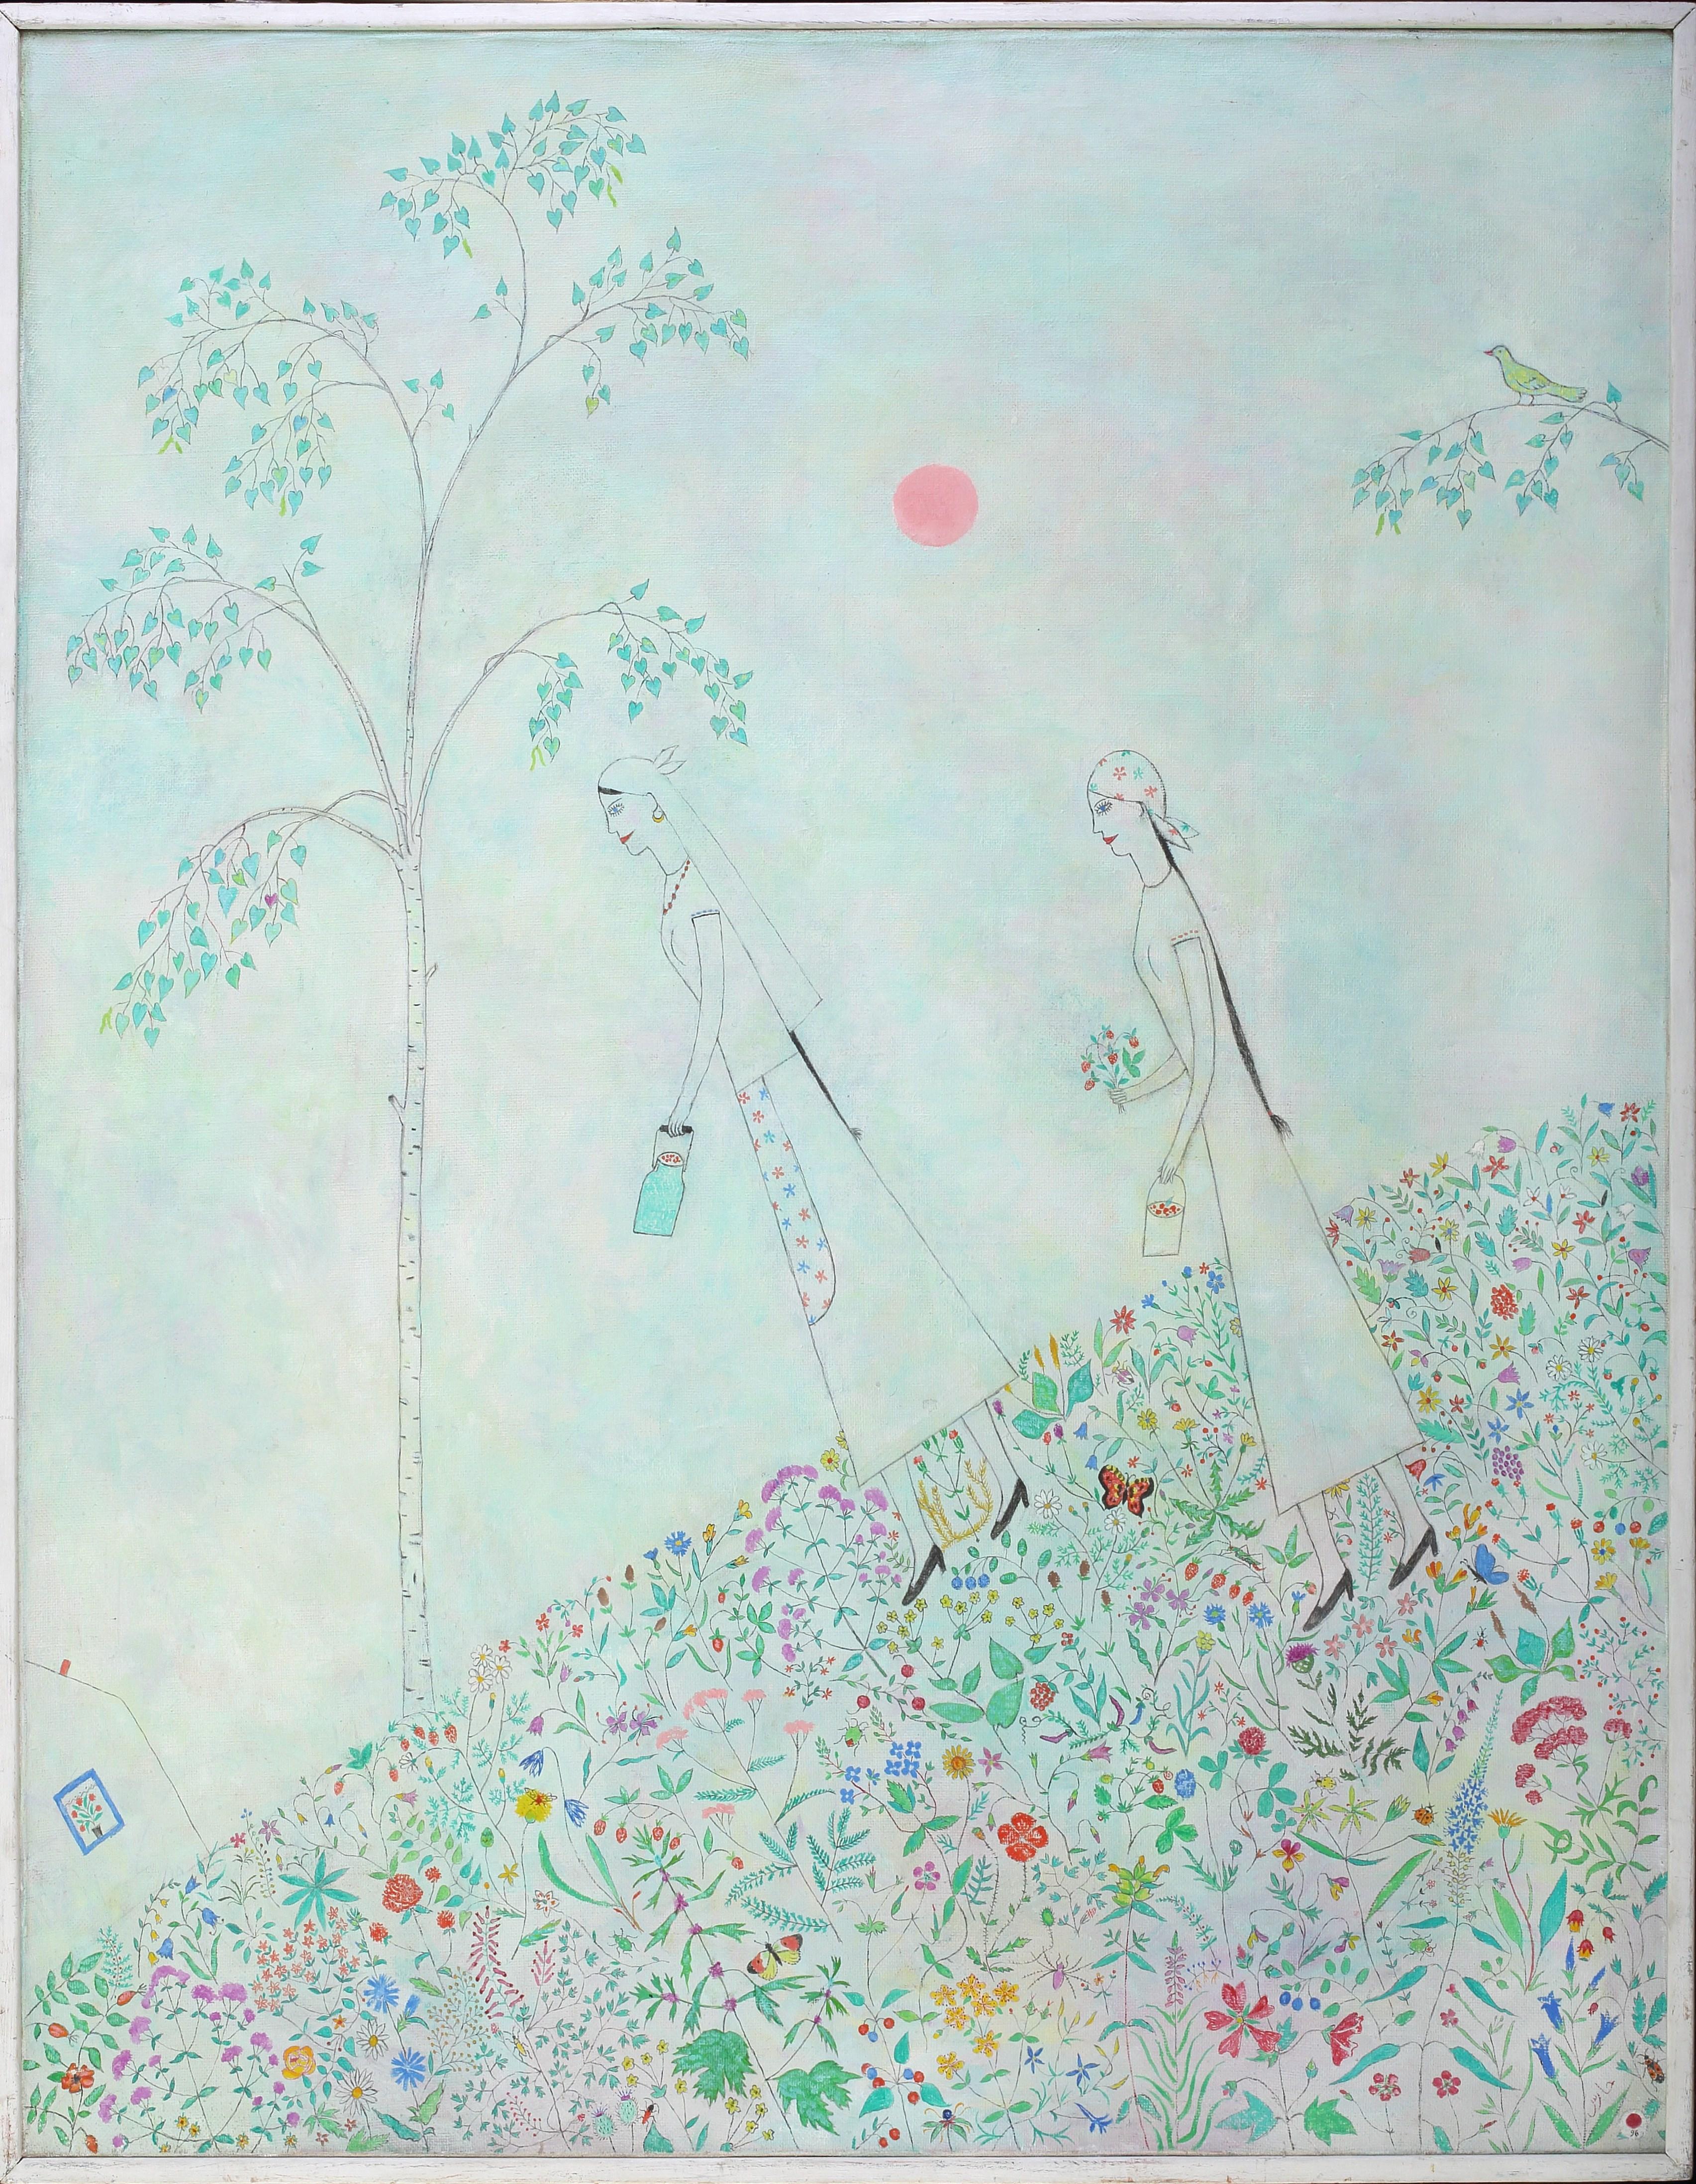 Ринат Харисов. За ягодами. 1996. Холст, акрил. 146х114. Коллекция Фонда Марджани.jpg